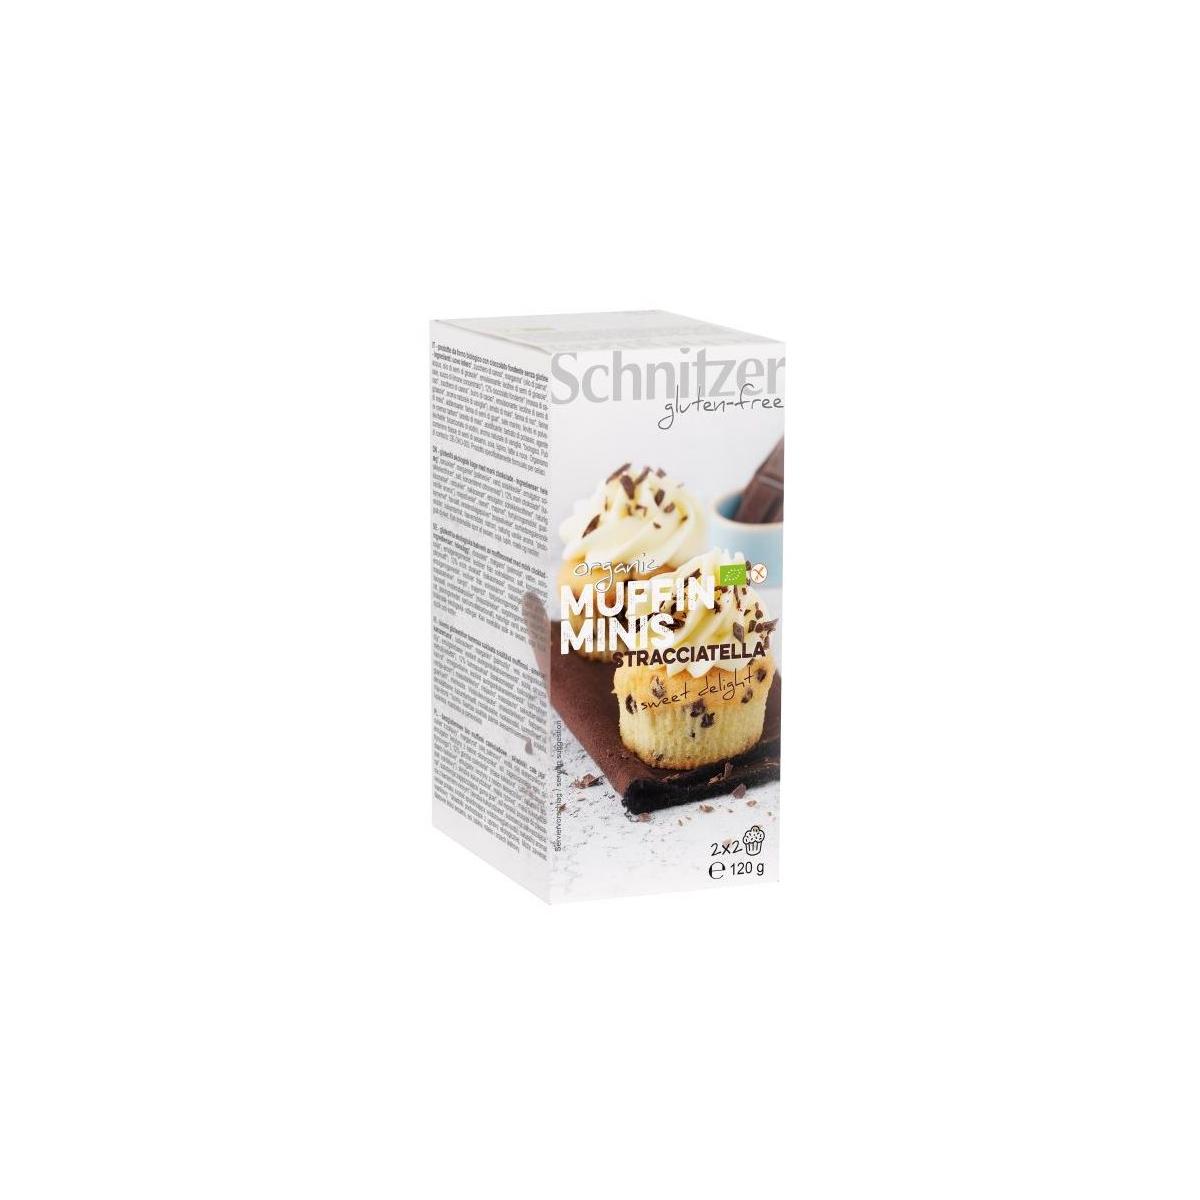 Bio Muffins Mini Stracciatella 4 Stk glutenfrei